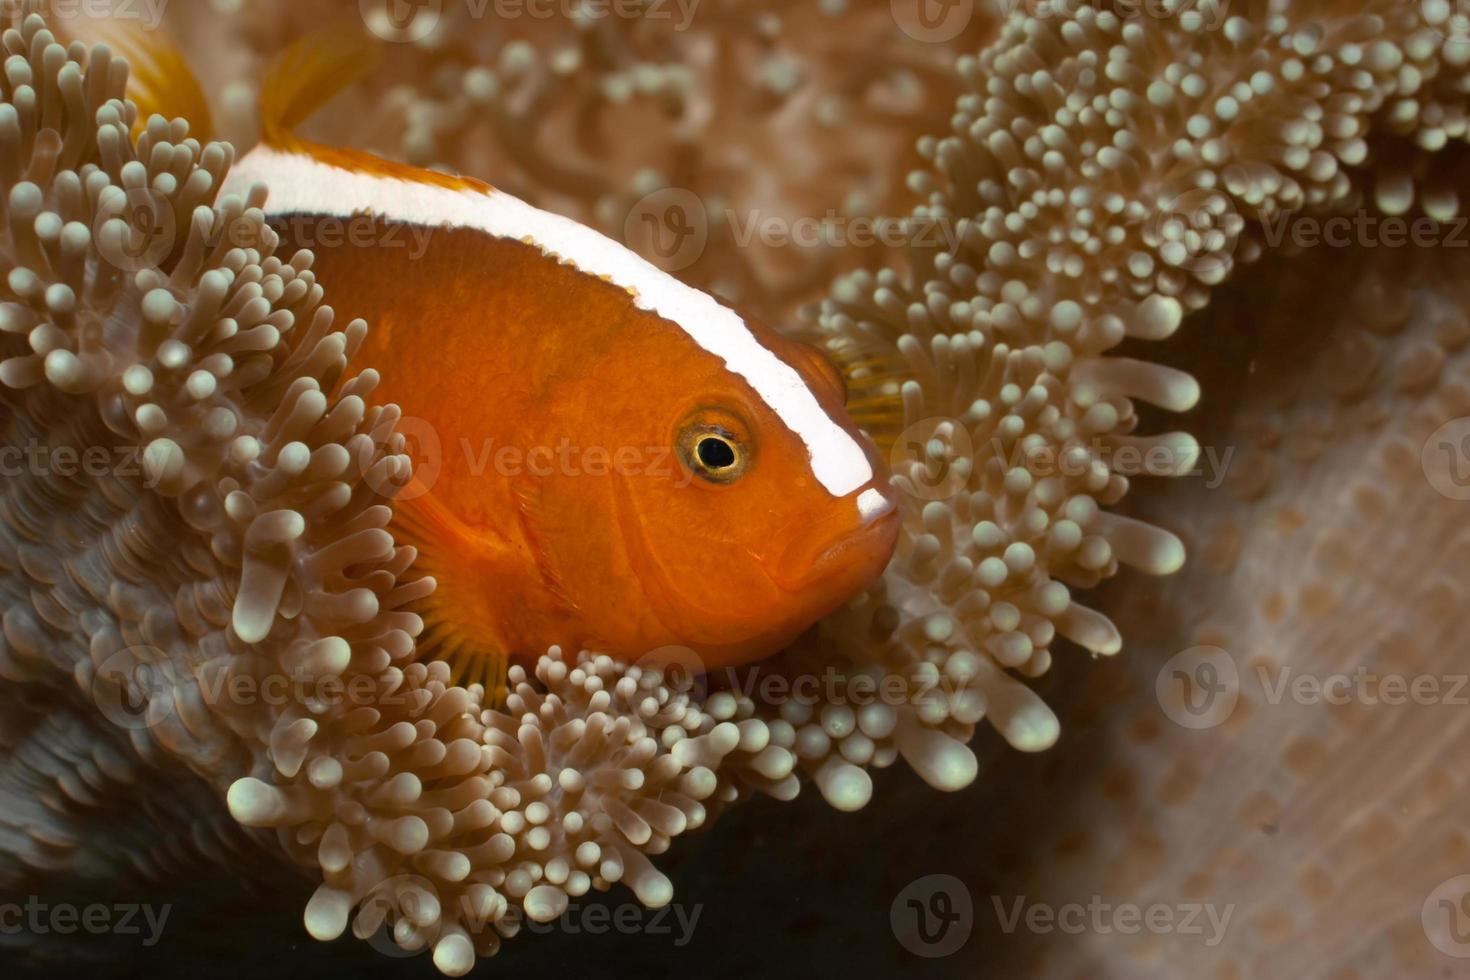 Orange Anemonefish Amphiprion sandaracinos in Merten's Carpet Sea Anemone photo